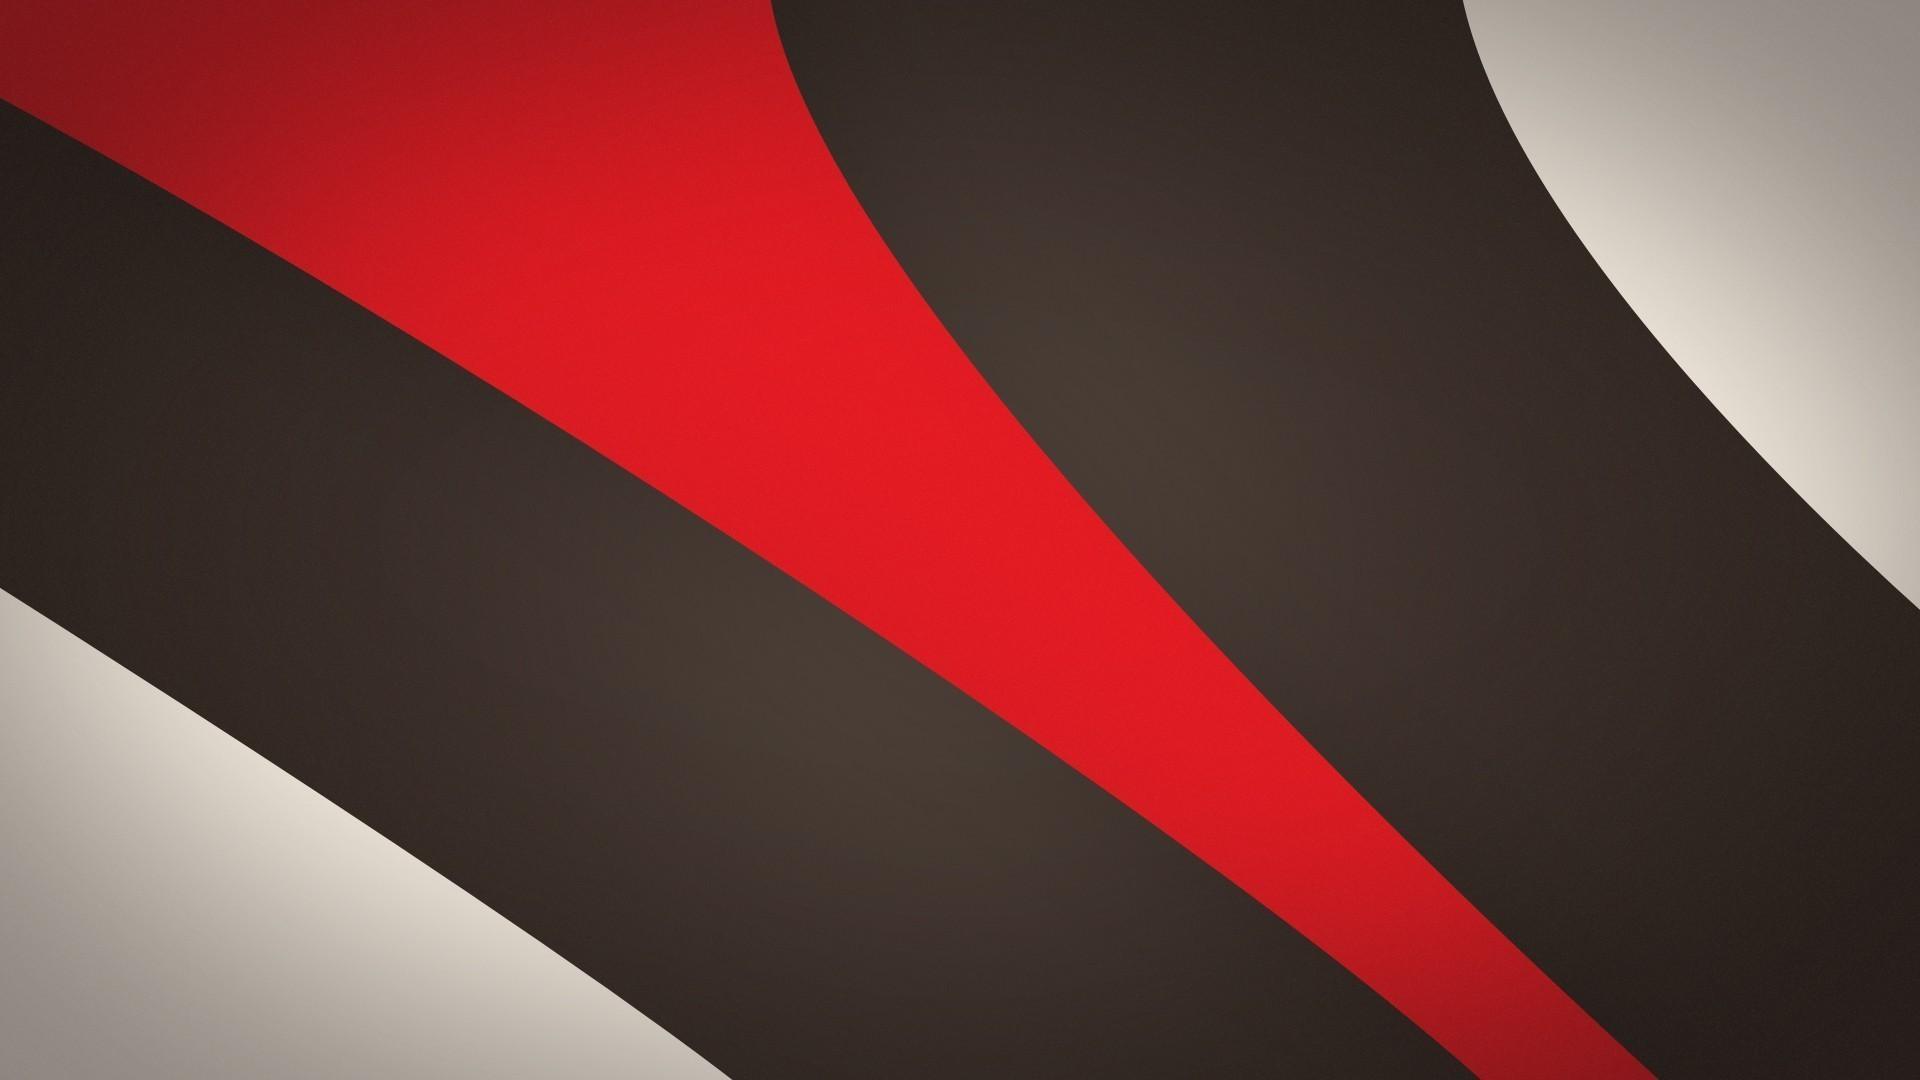 Red wallpaper HD  Download free backgrounds for desktop